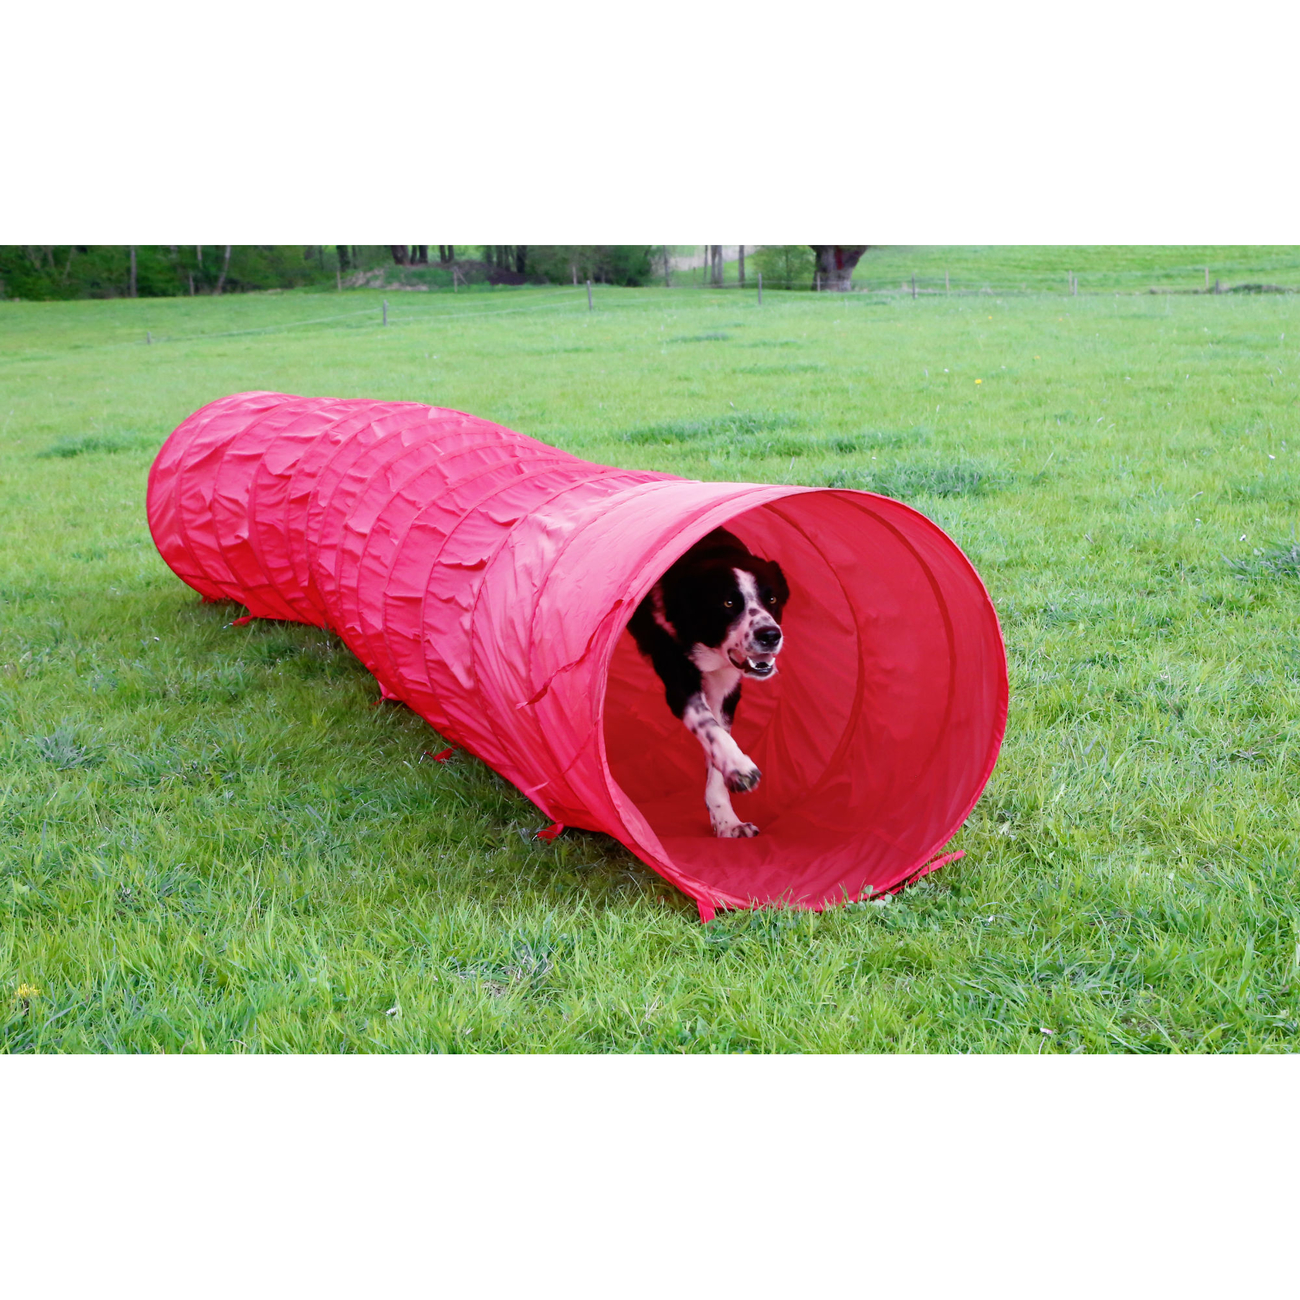 Kerbl Agility Hundetunnel rot, 5m, Bild 8